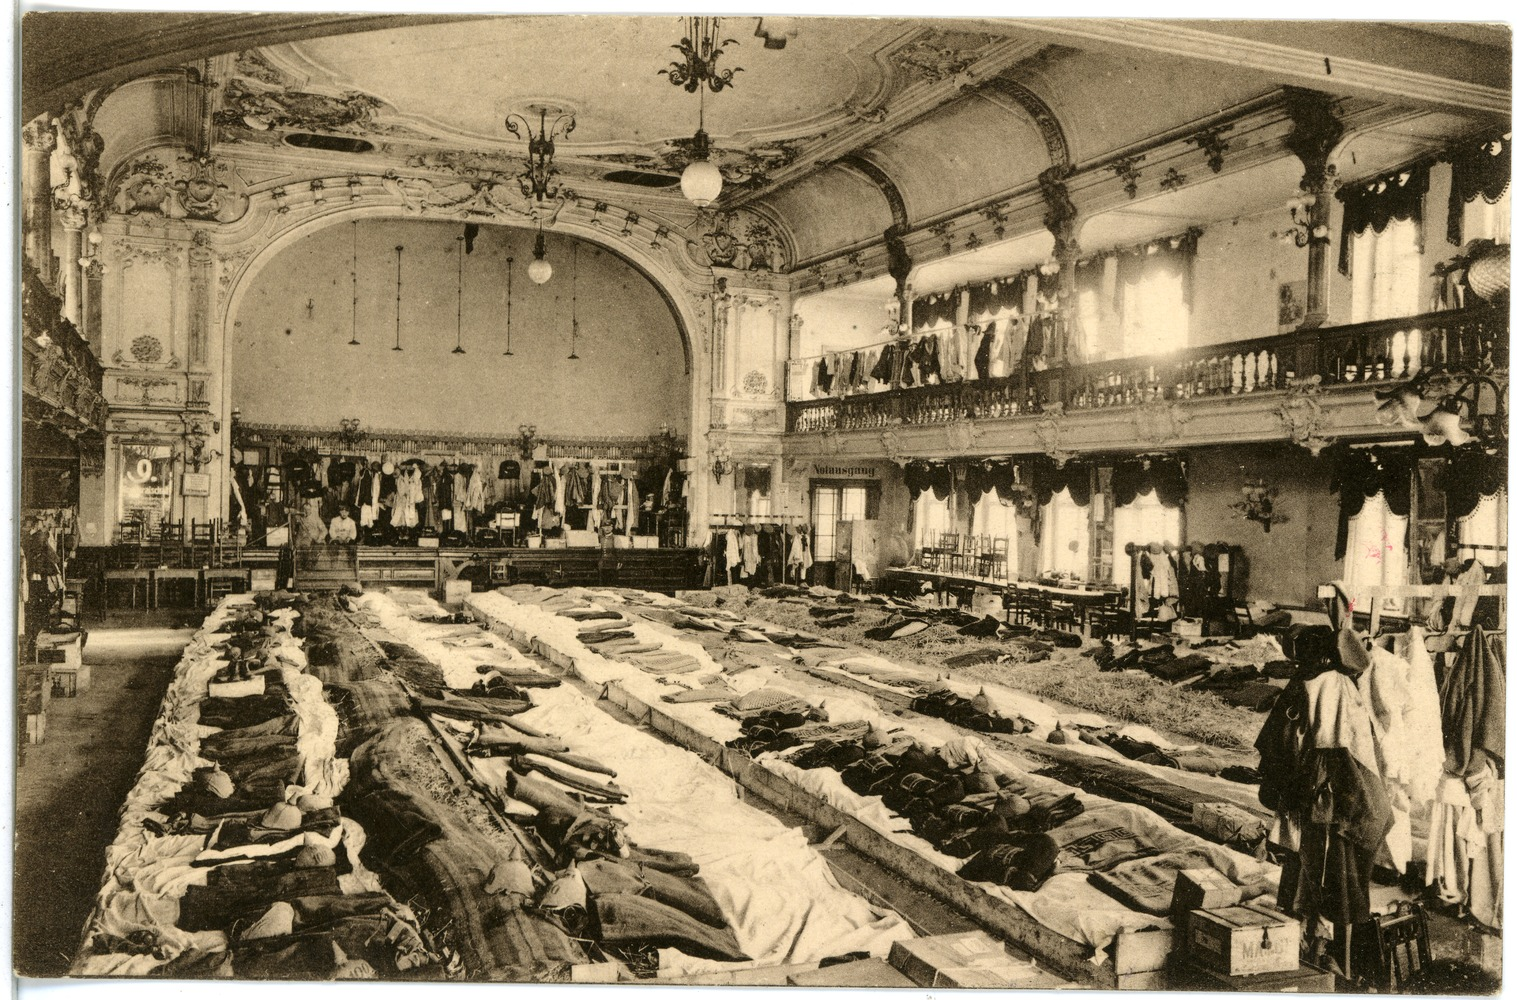 File:18895-Meißen-1915-Hotel Goldene Sonne, Saal Im Kriegsjahr 1915-Brück & Sohn Kunstverlag.jpg